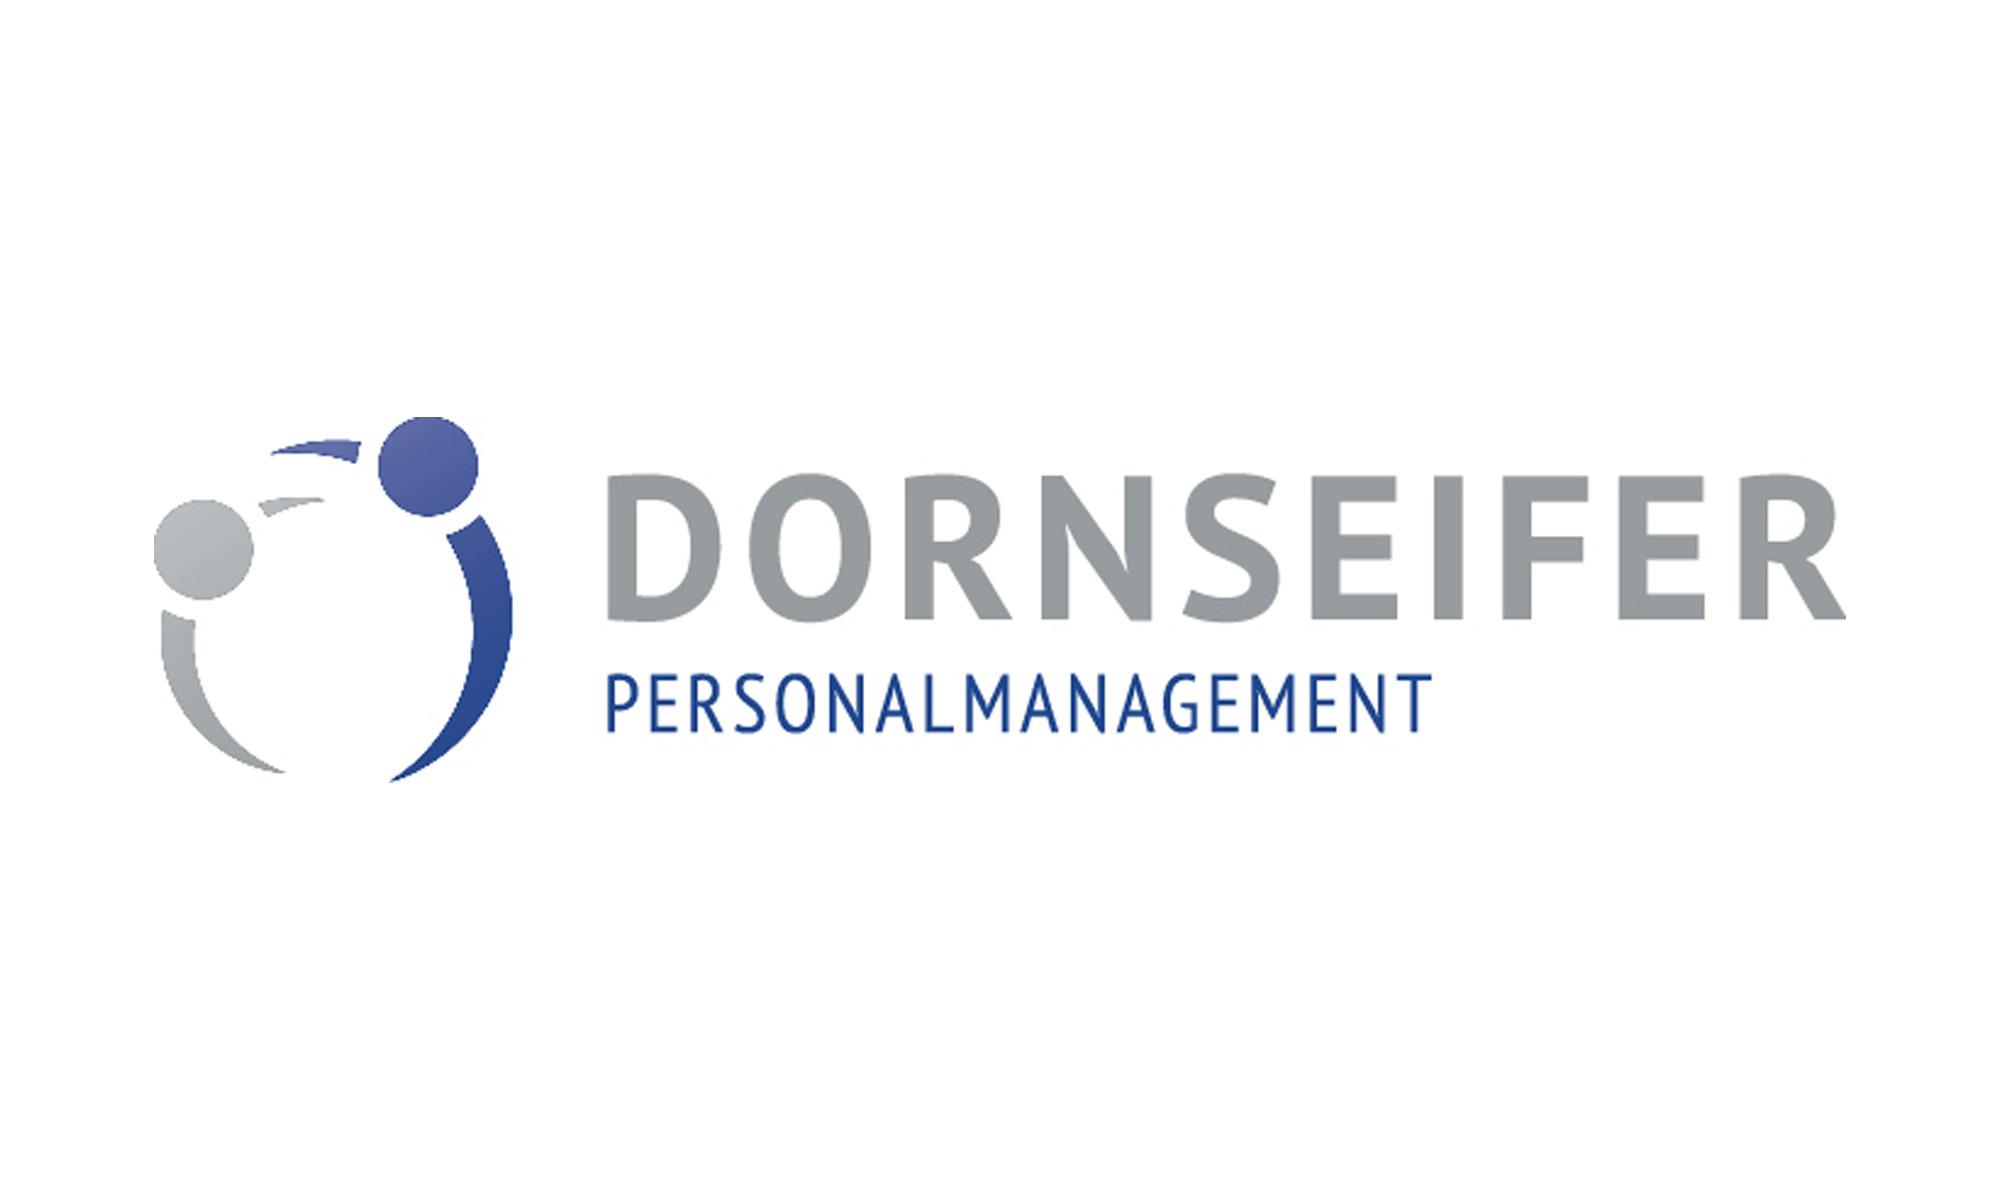 Dornseifer Personalmanagement